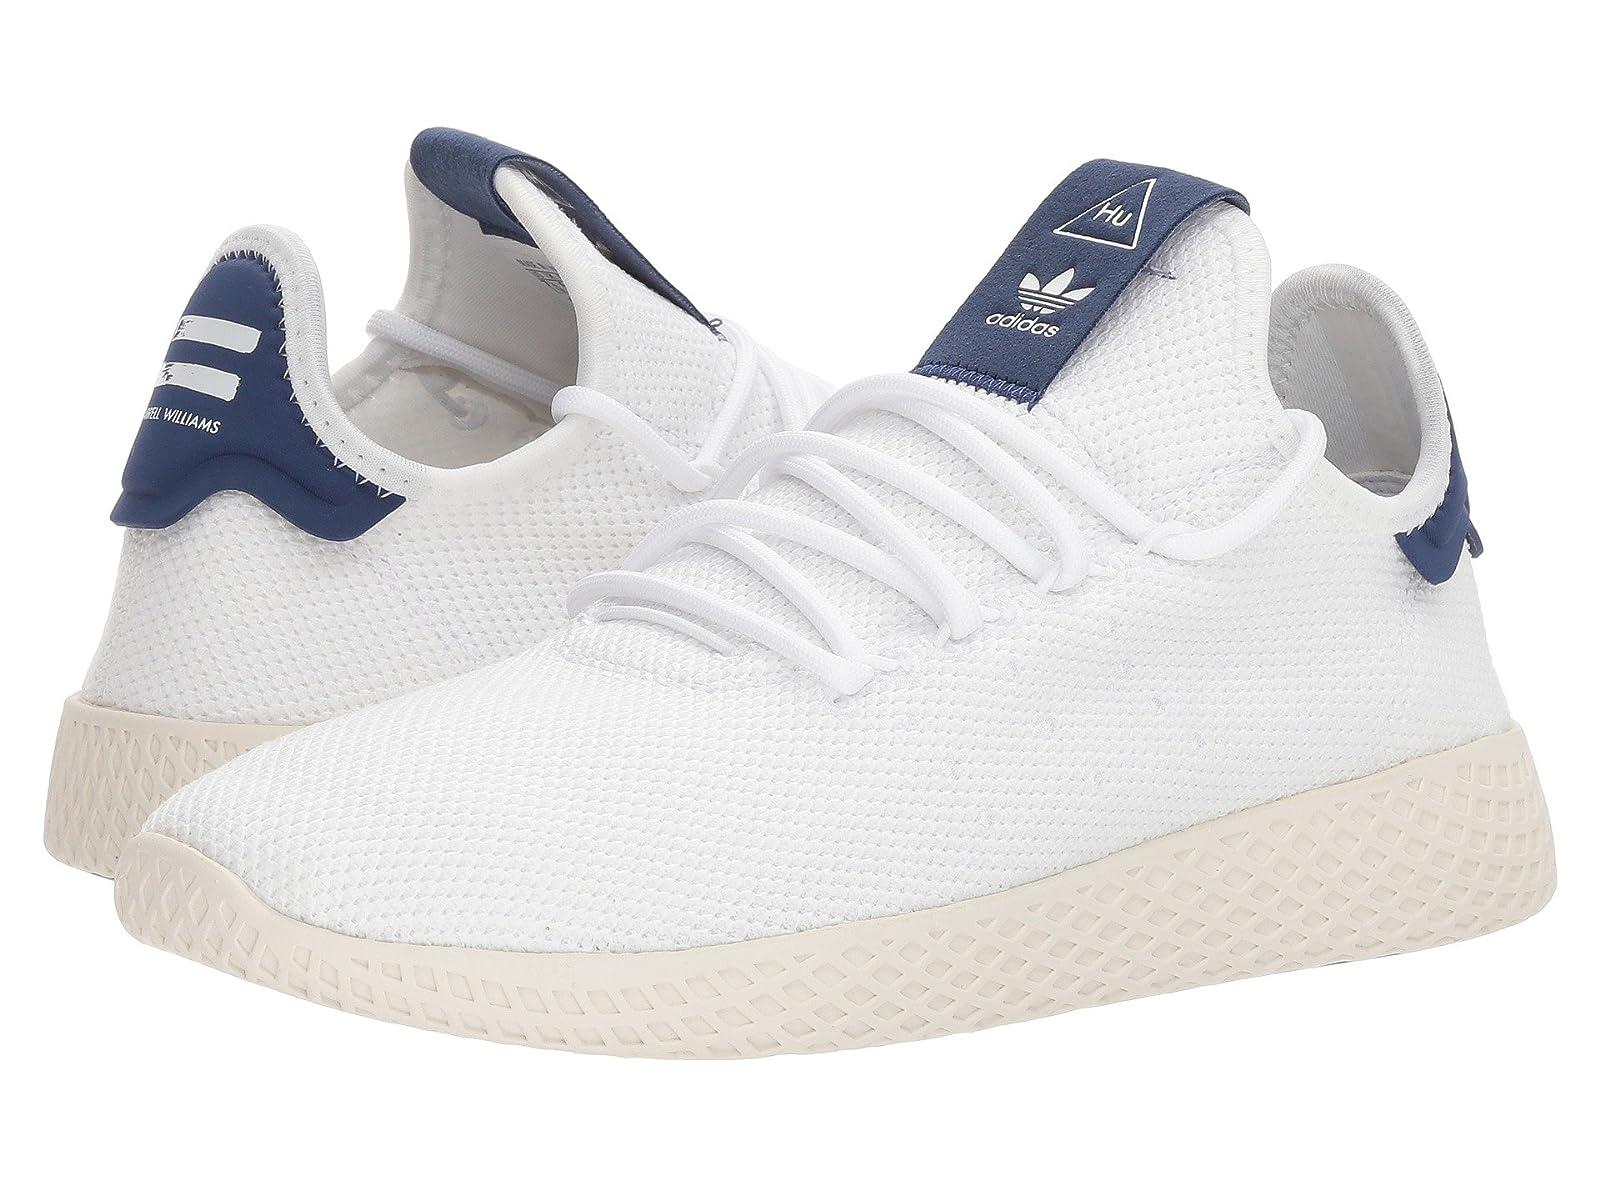 adidas Originals PW Tennis HUAtmospheric grades have affordable shoes